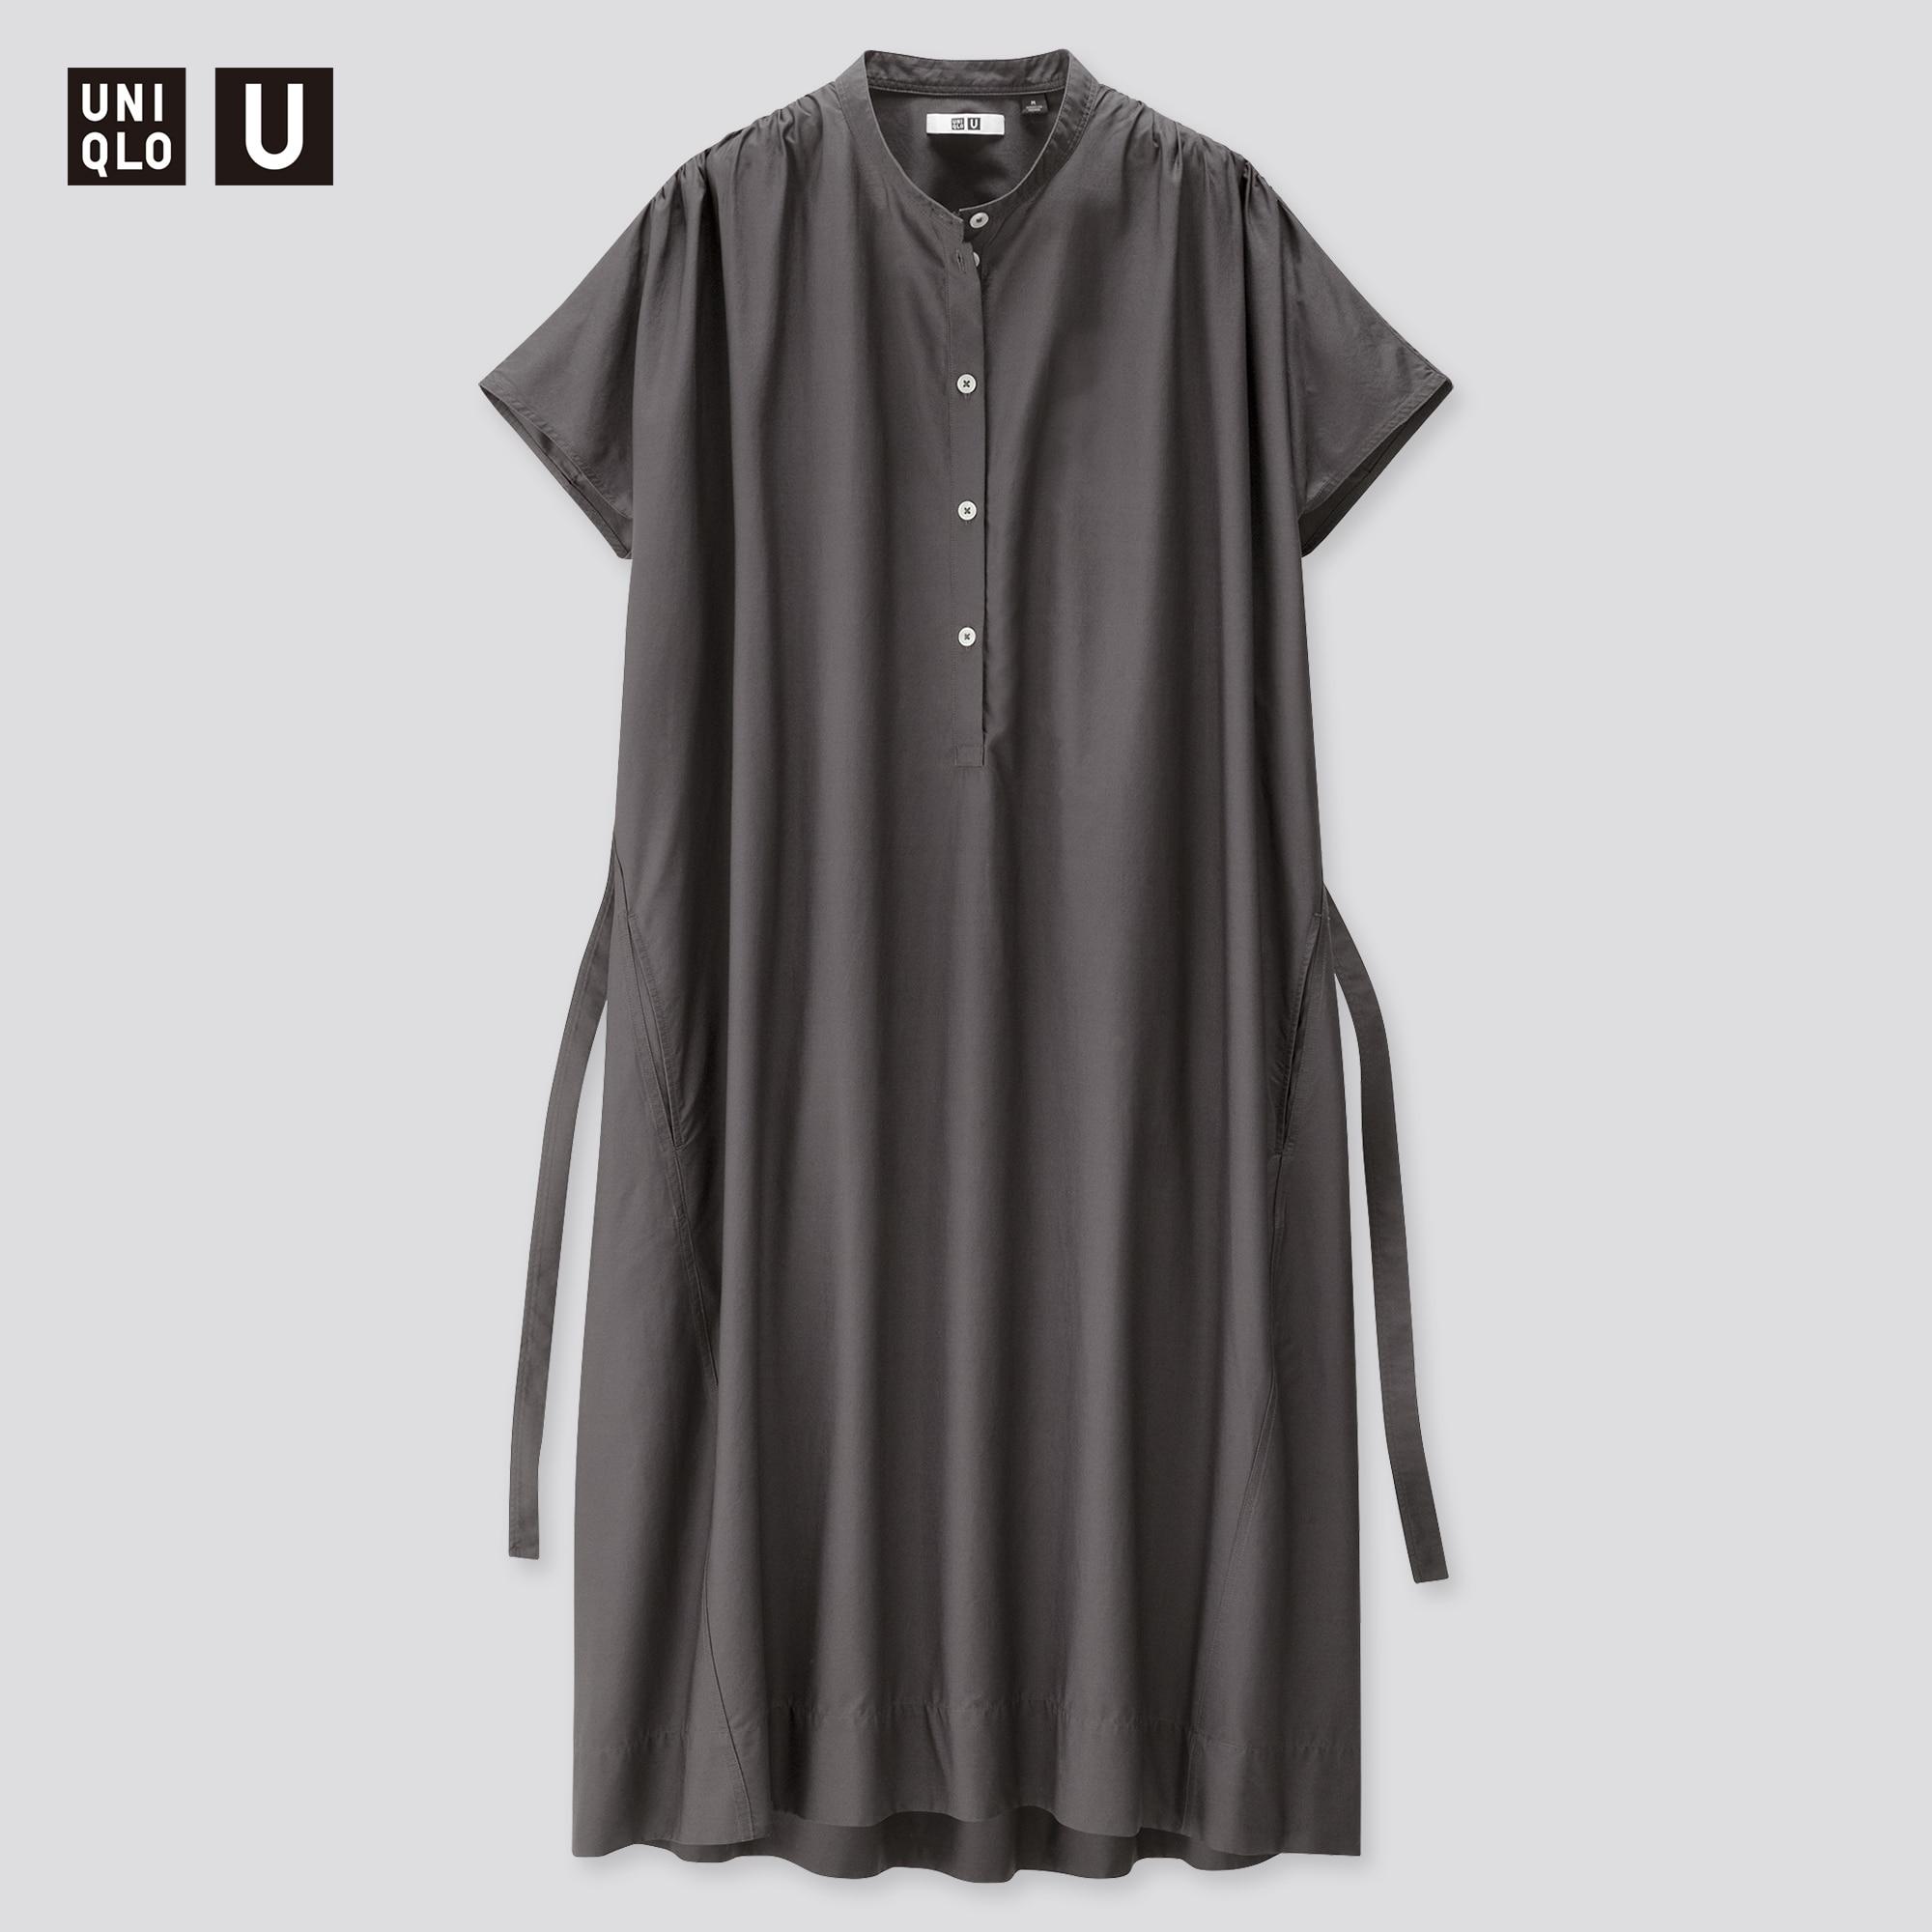 Women Uniqlo U Parachute Short Sleeved Shirt Dress